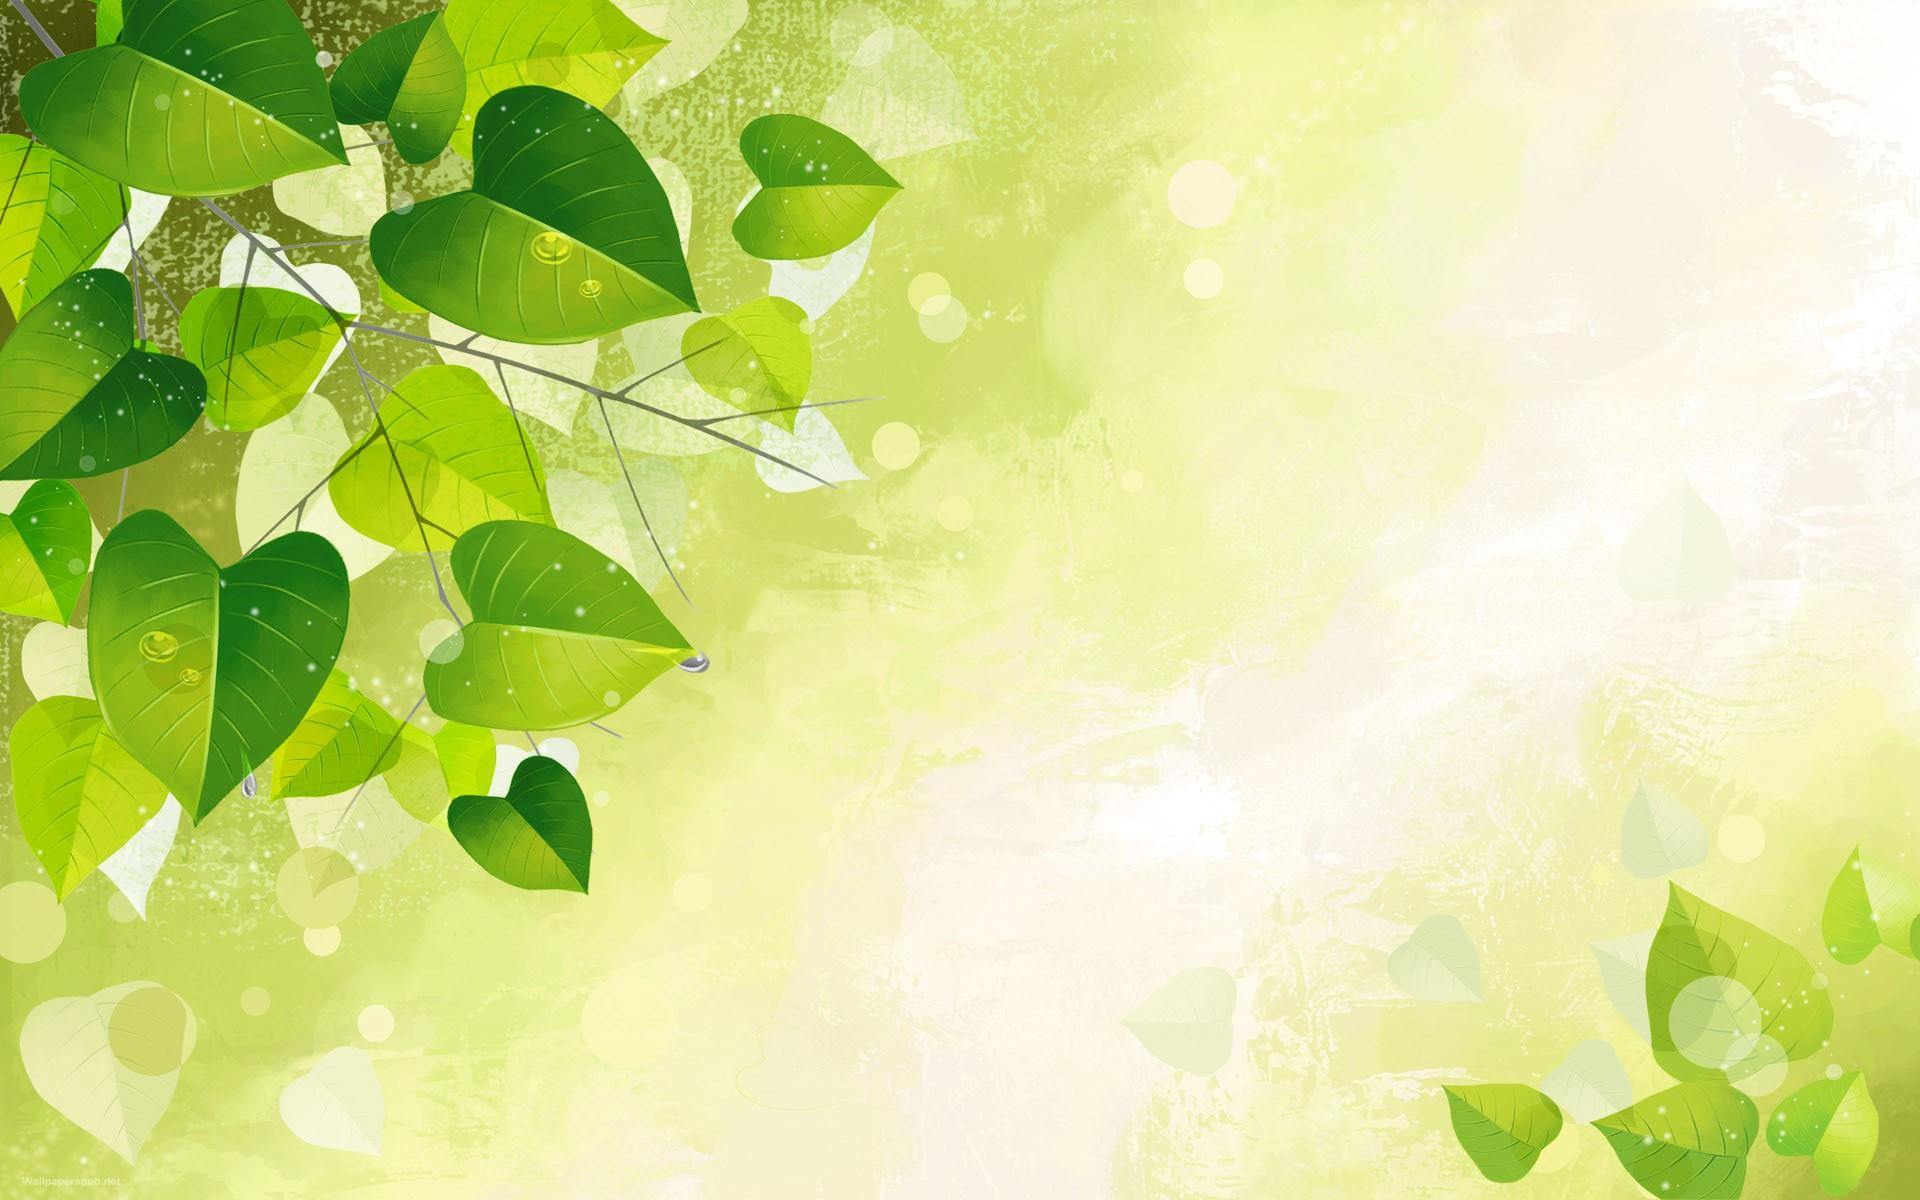 47 Leaf Wallpaper Designs On Wallpapersafari